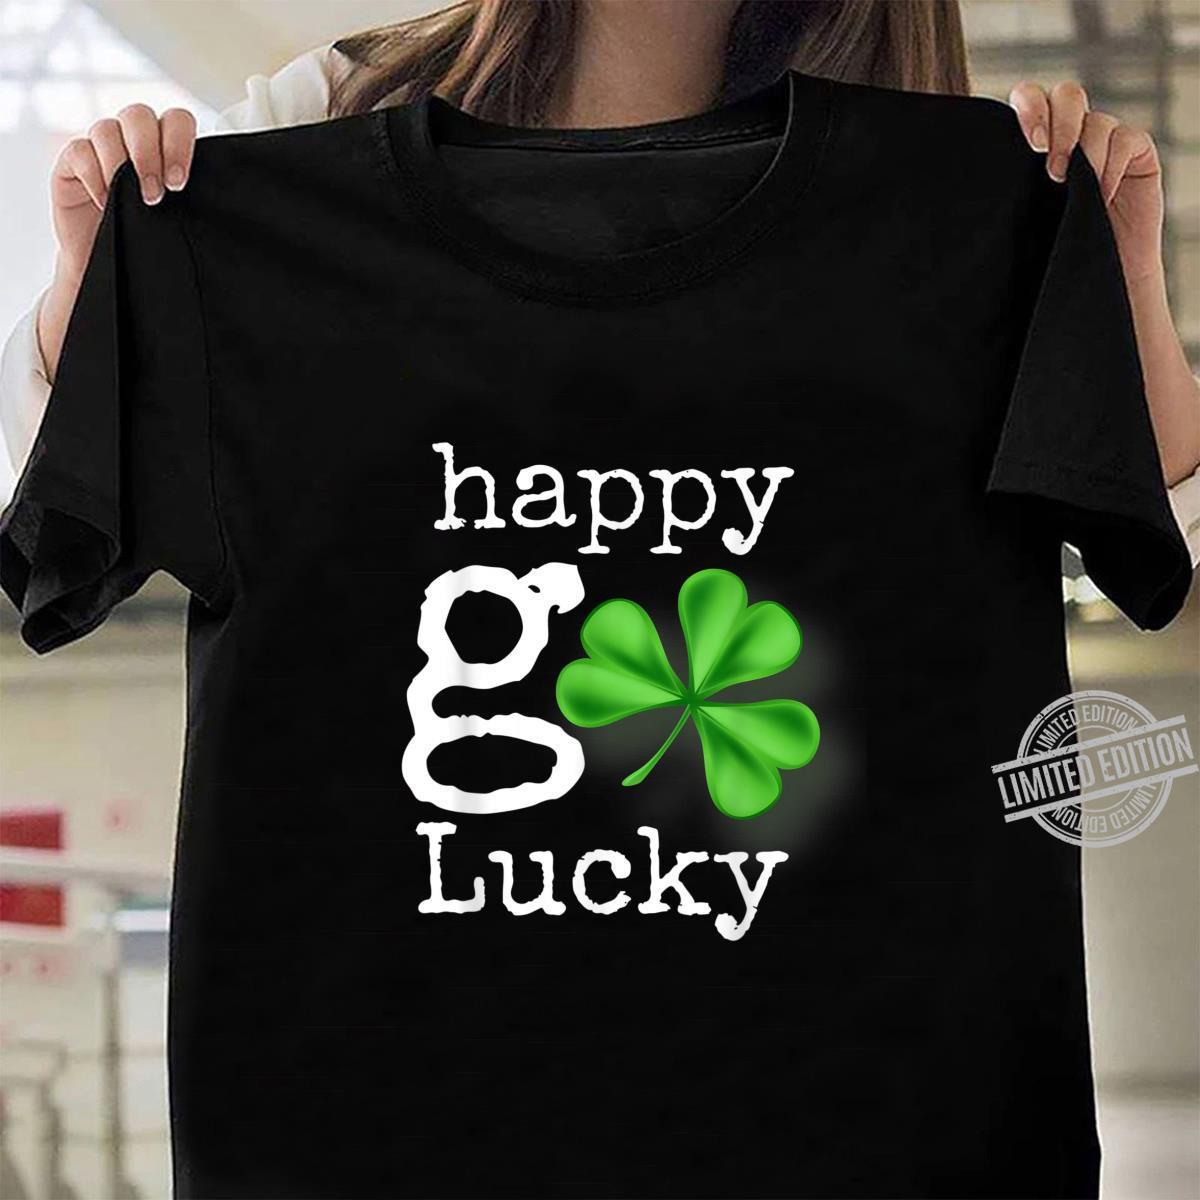 Lucky St Patrick/'s Day T-Shirt Patty/'s Day Unisex Shirt St Shamrock Shirt Happy Go Lucky Shirt